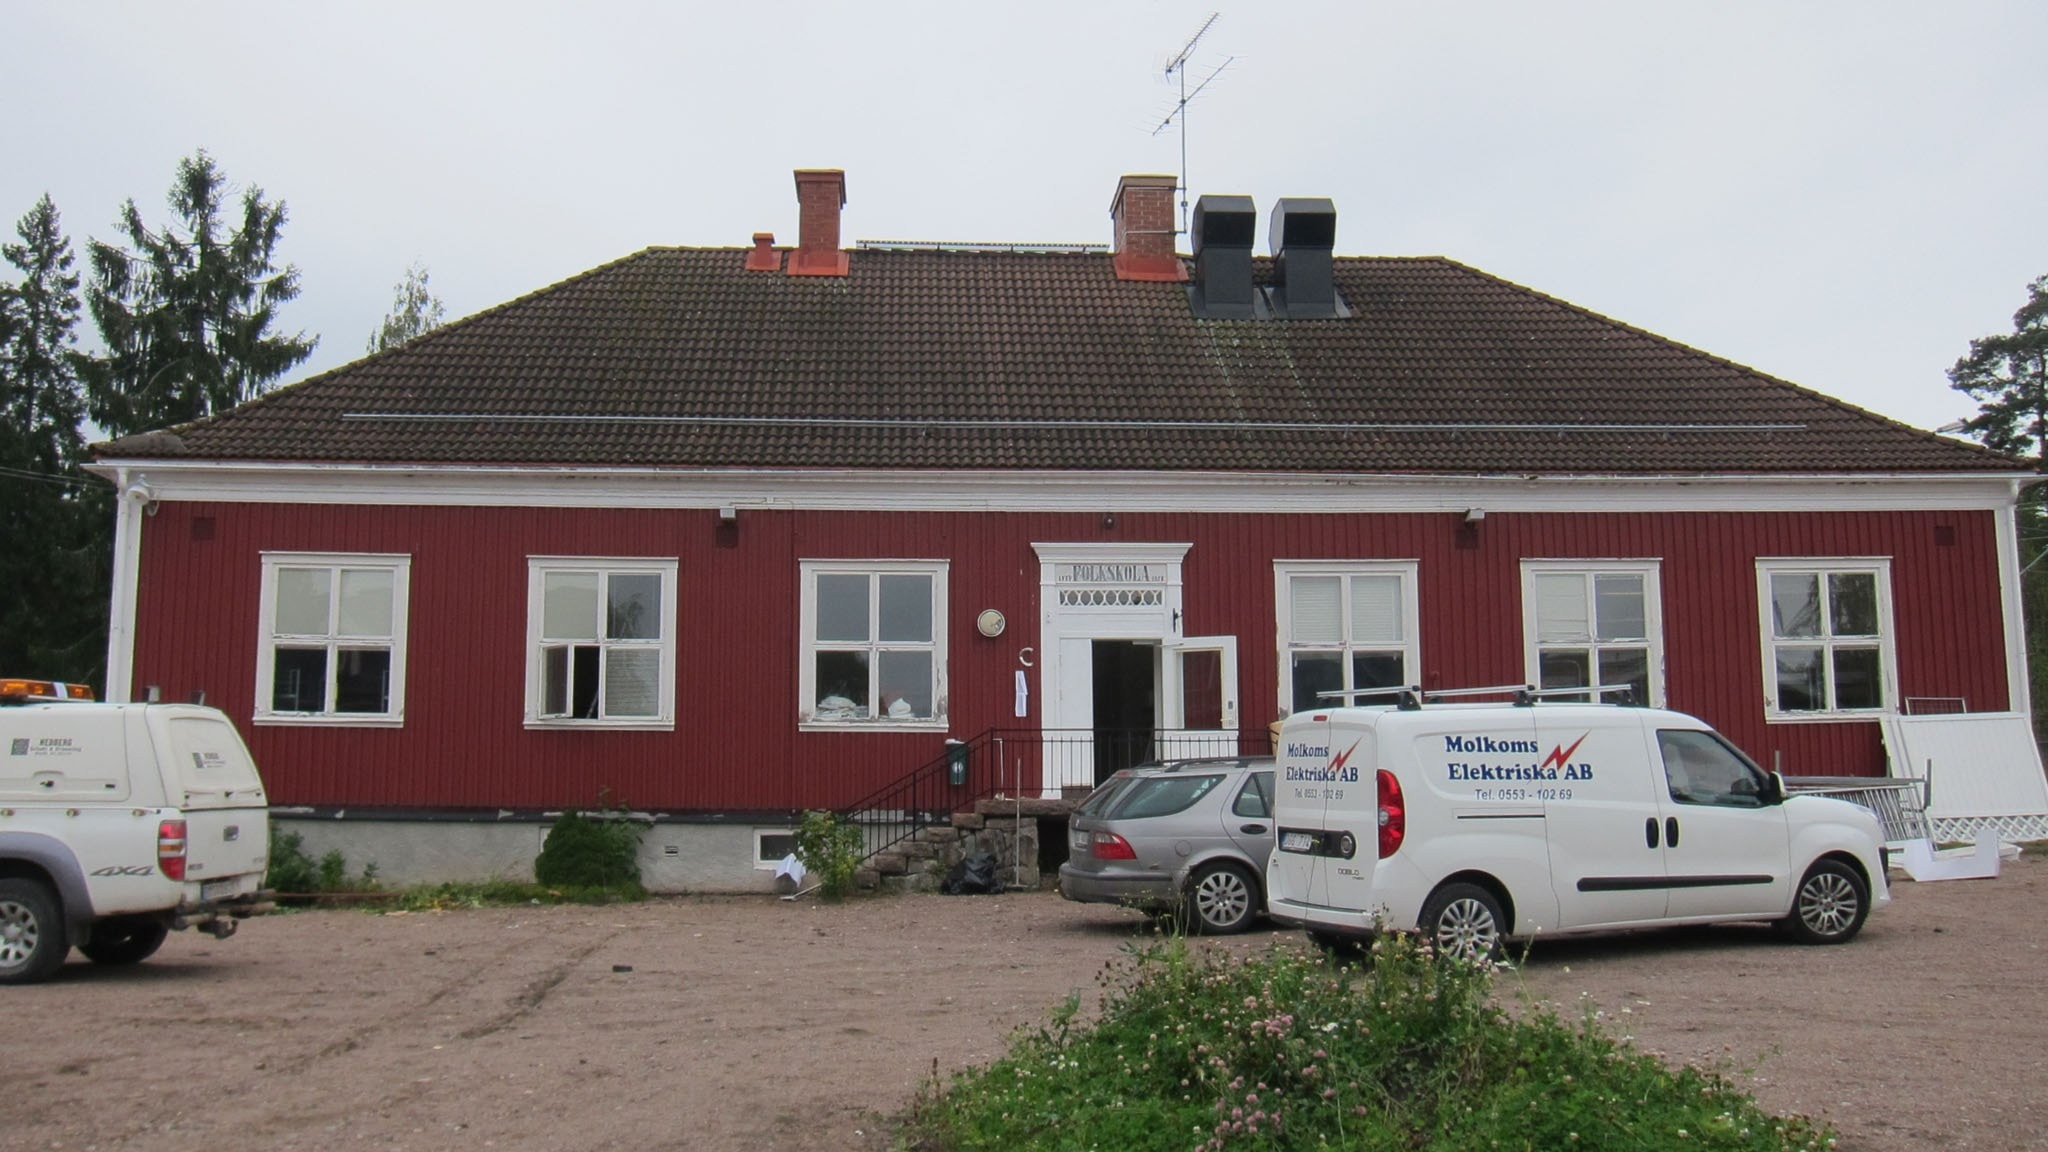 Kerstin Maria Karlsson, 73 r i Molkom p Gaperud 937